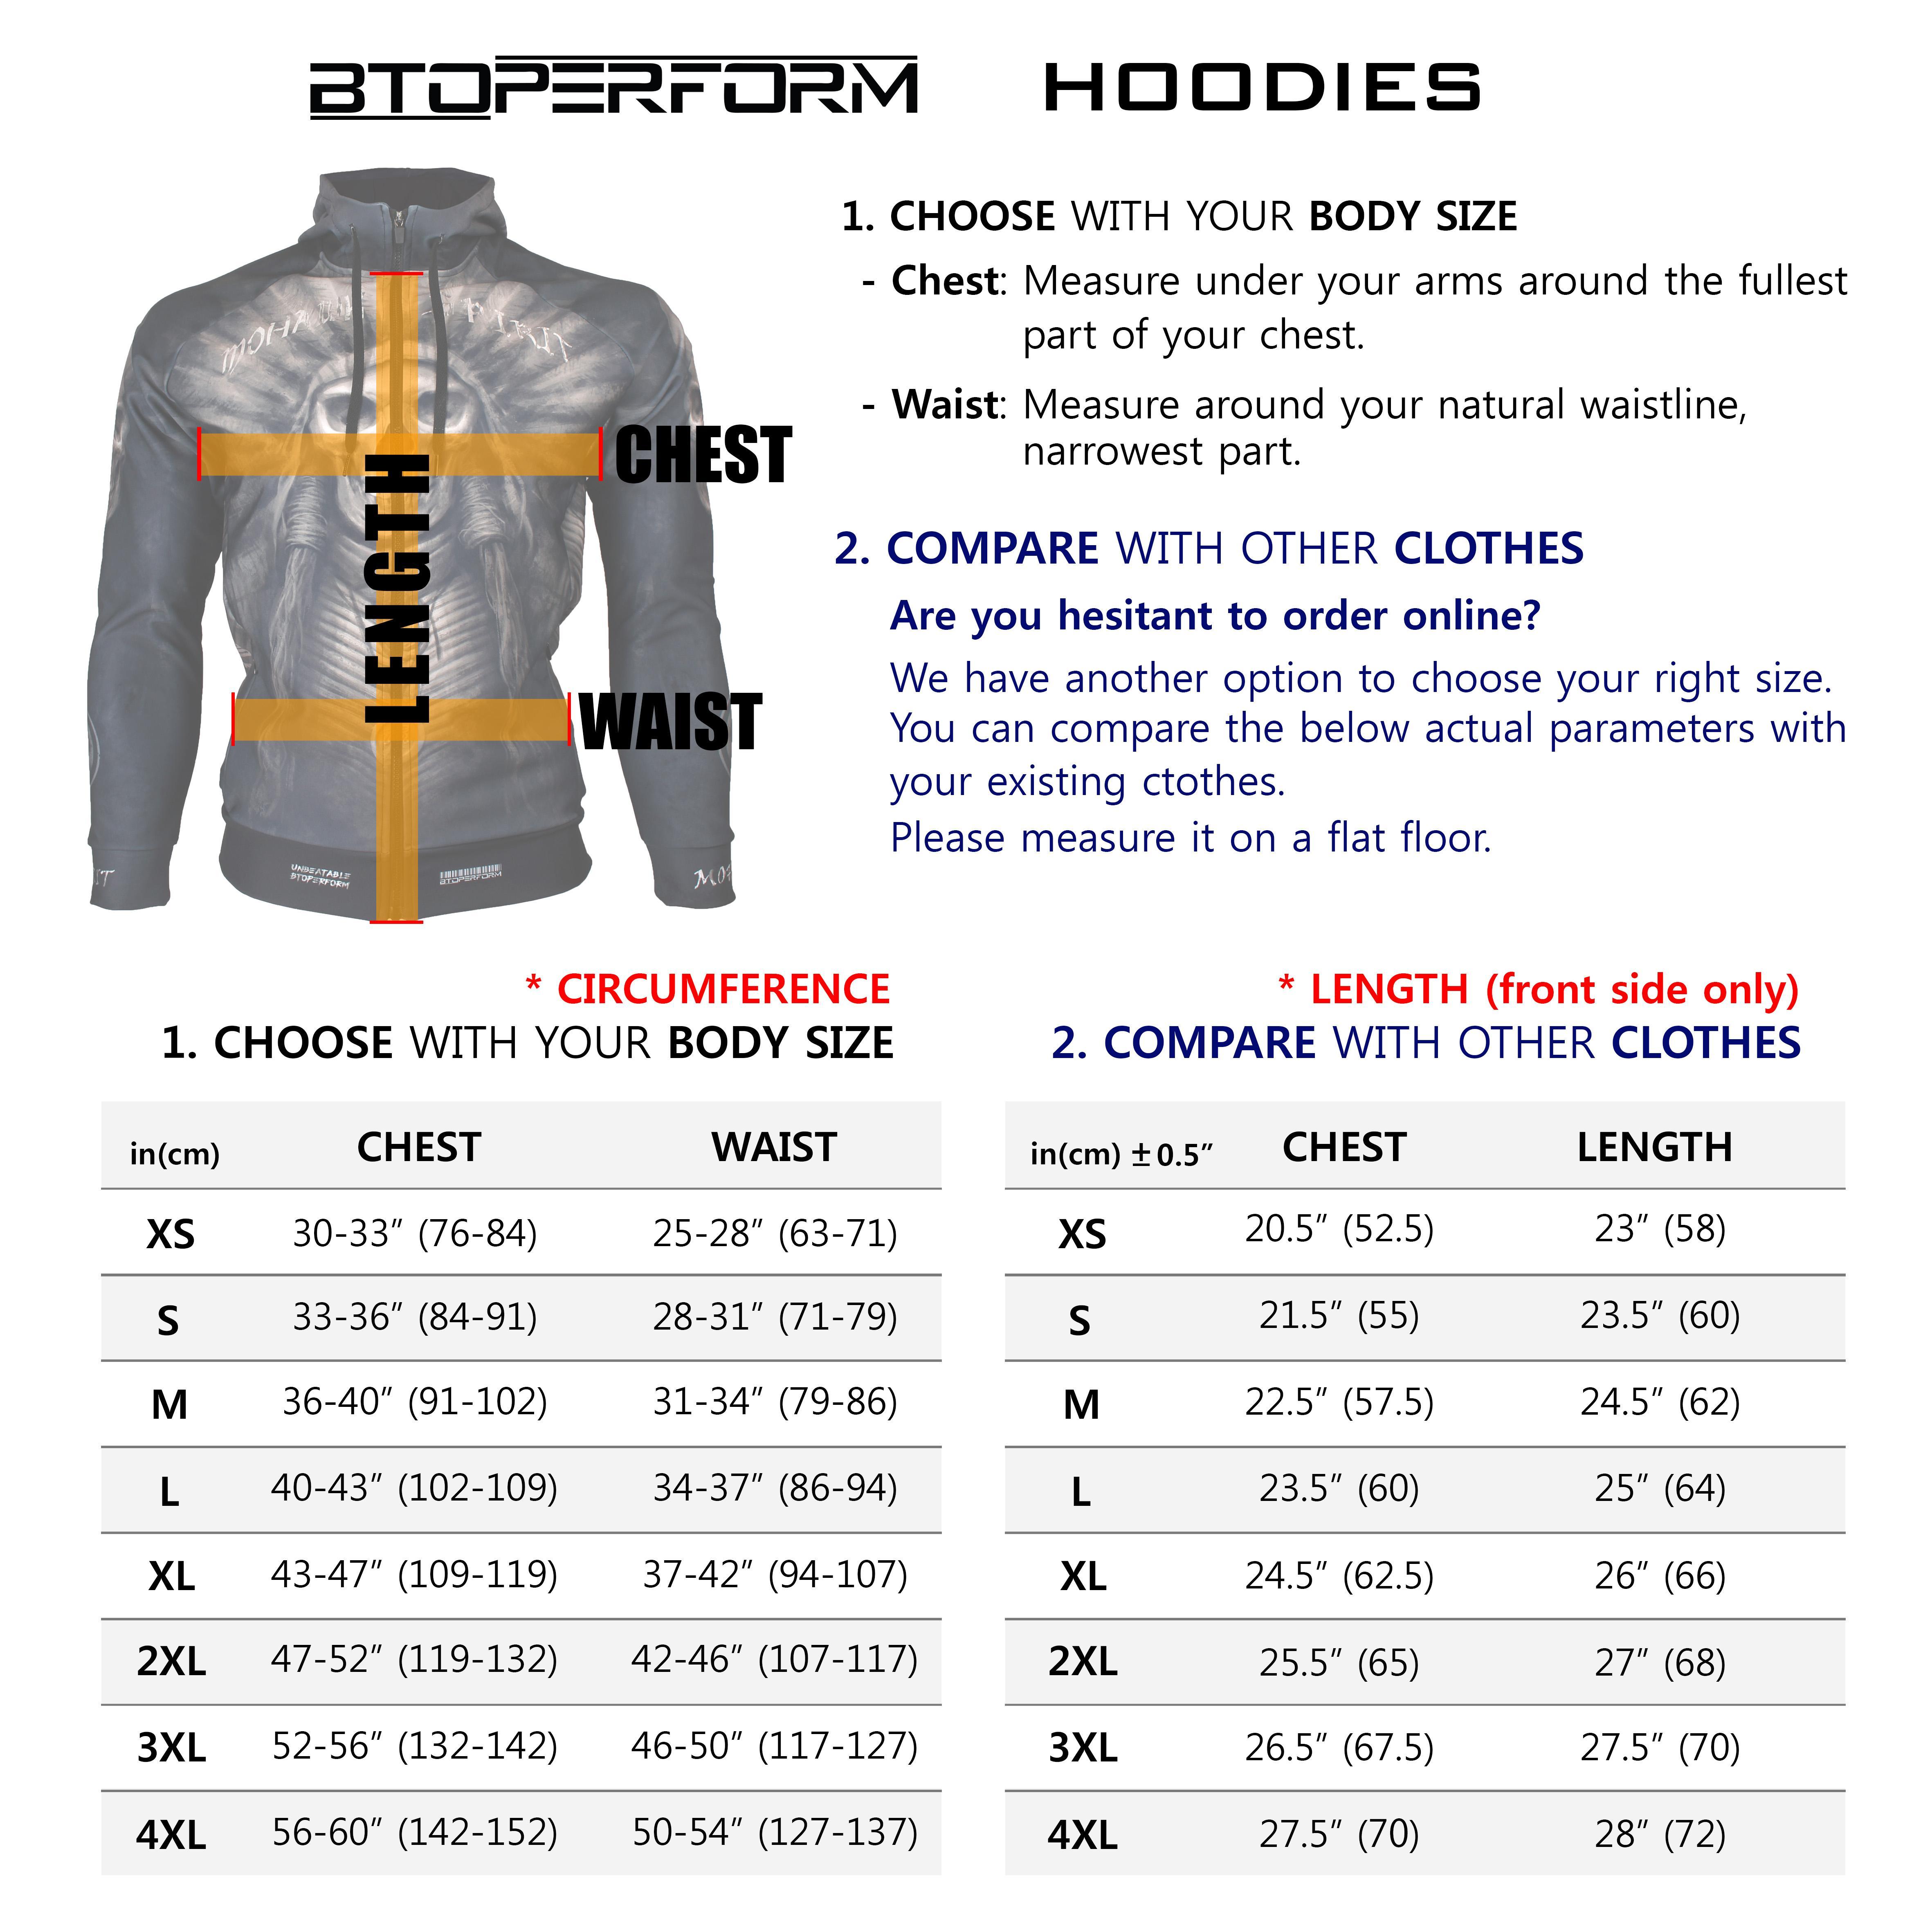 Btoperform Hoodies Sizing Chart